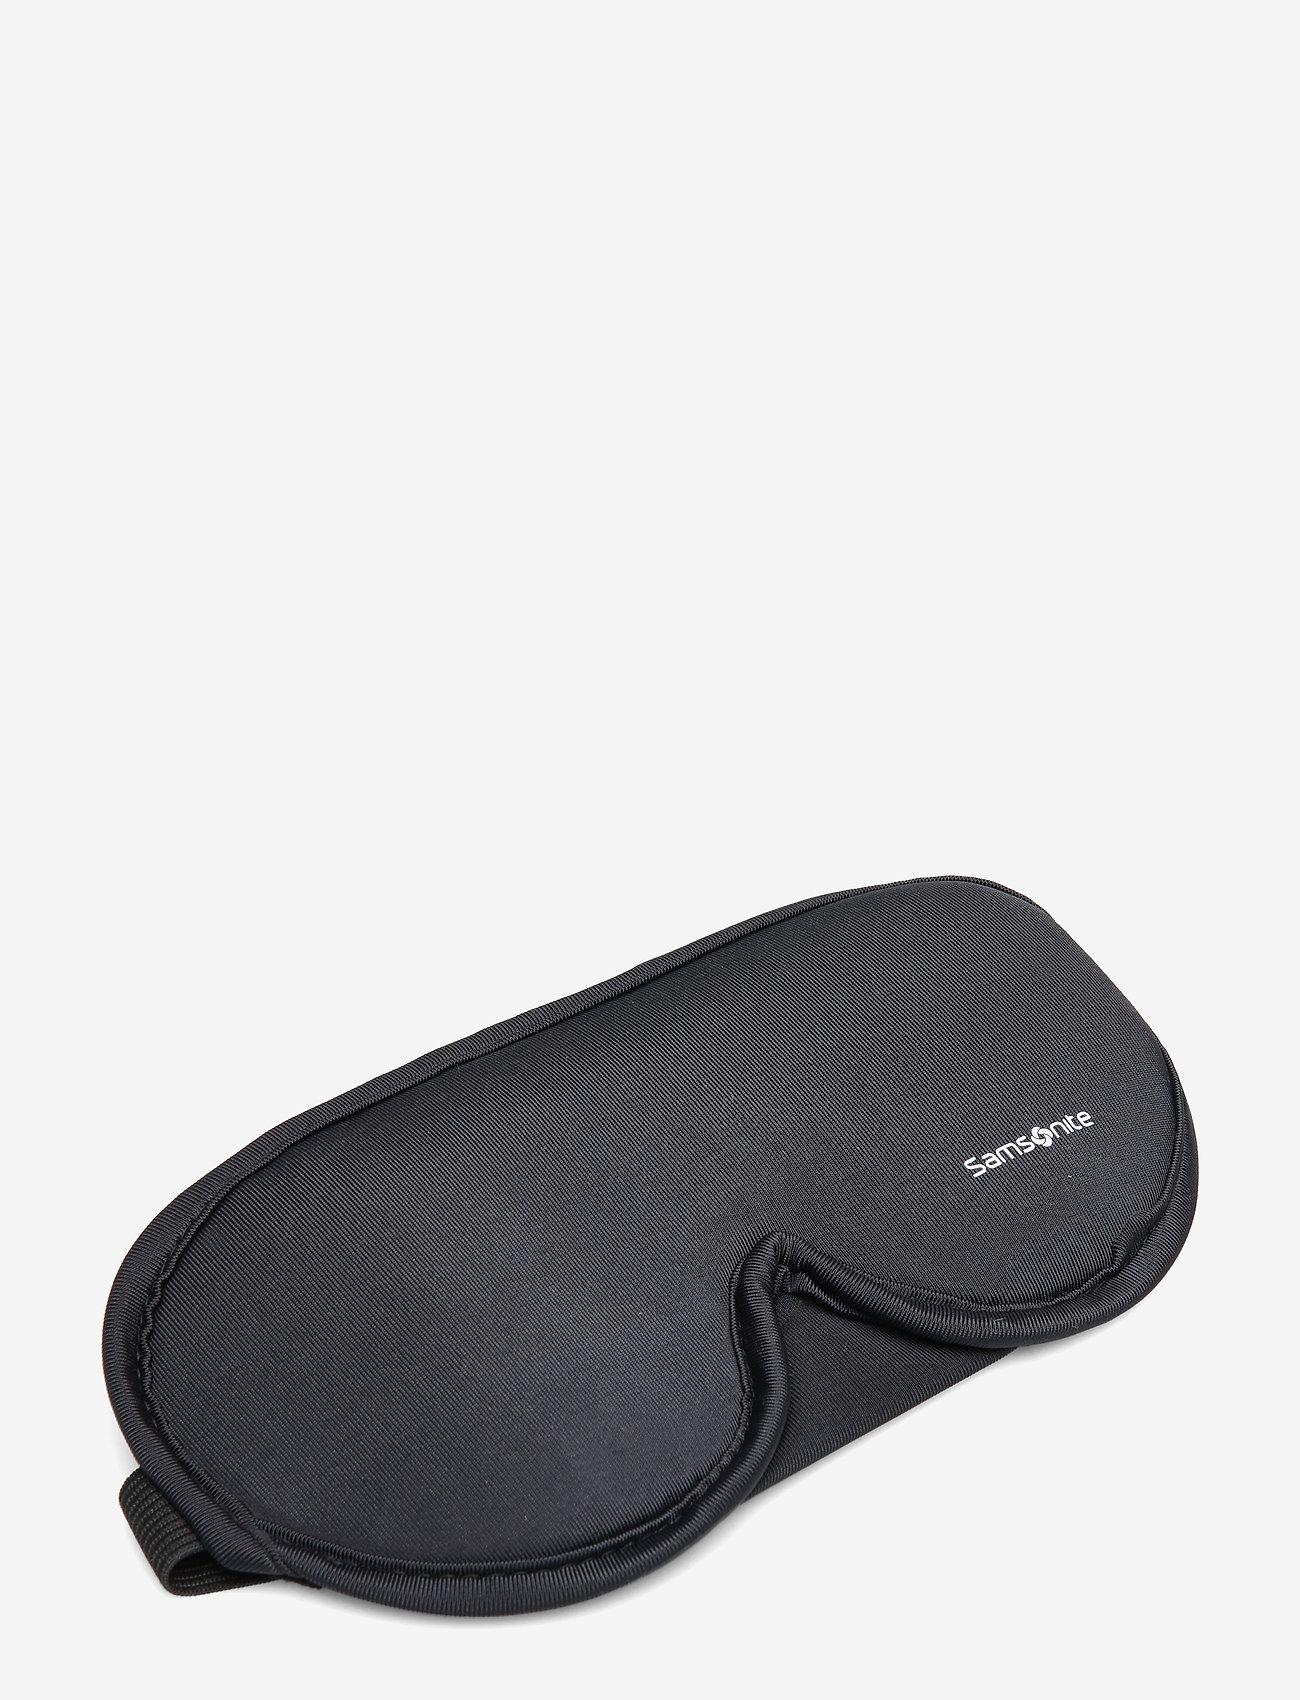 Samsonite - Comfort Travelling Eye Mask And Earplugs - travel accessories - black - 0